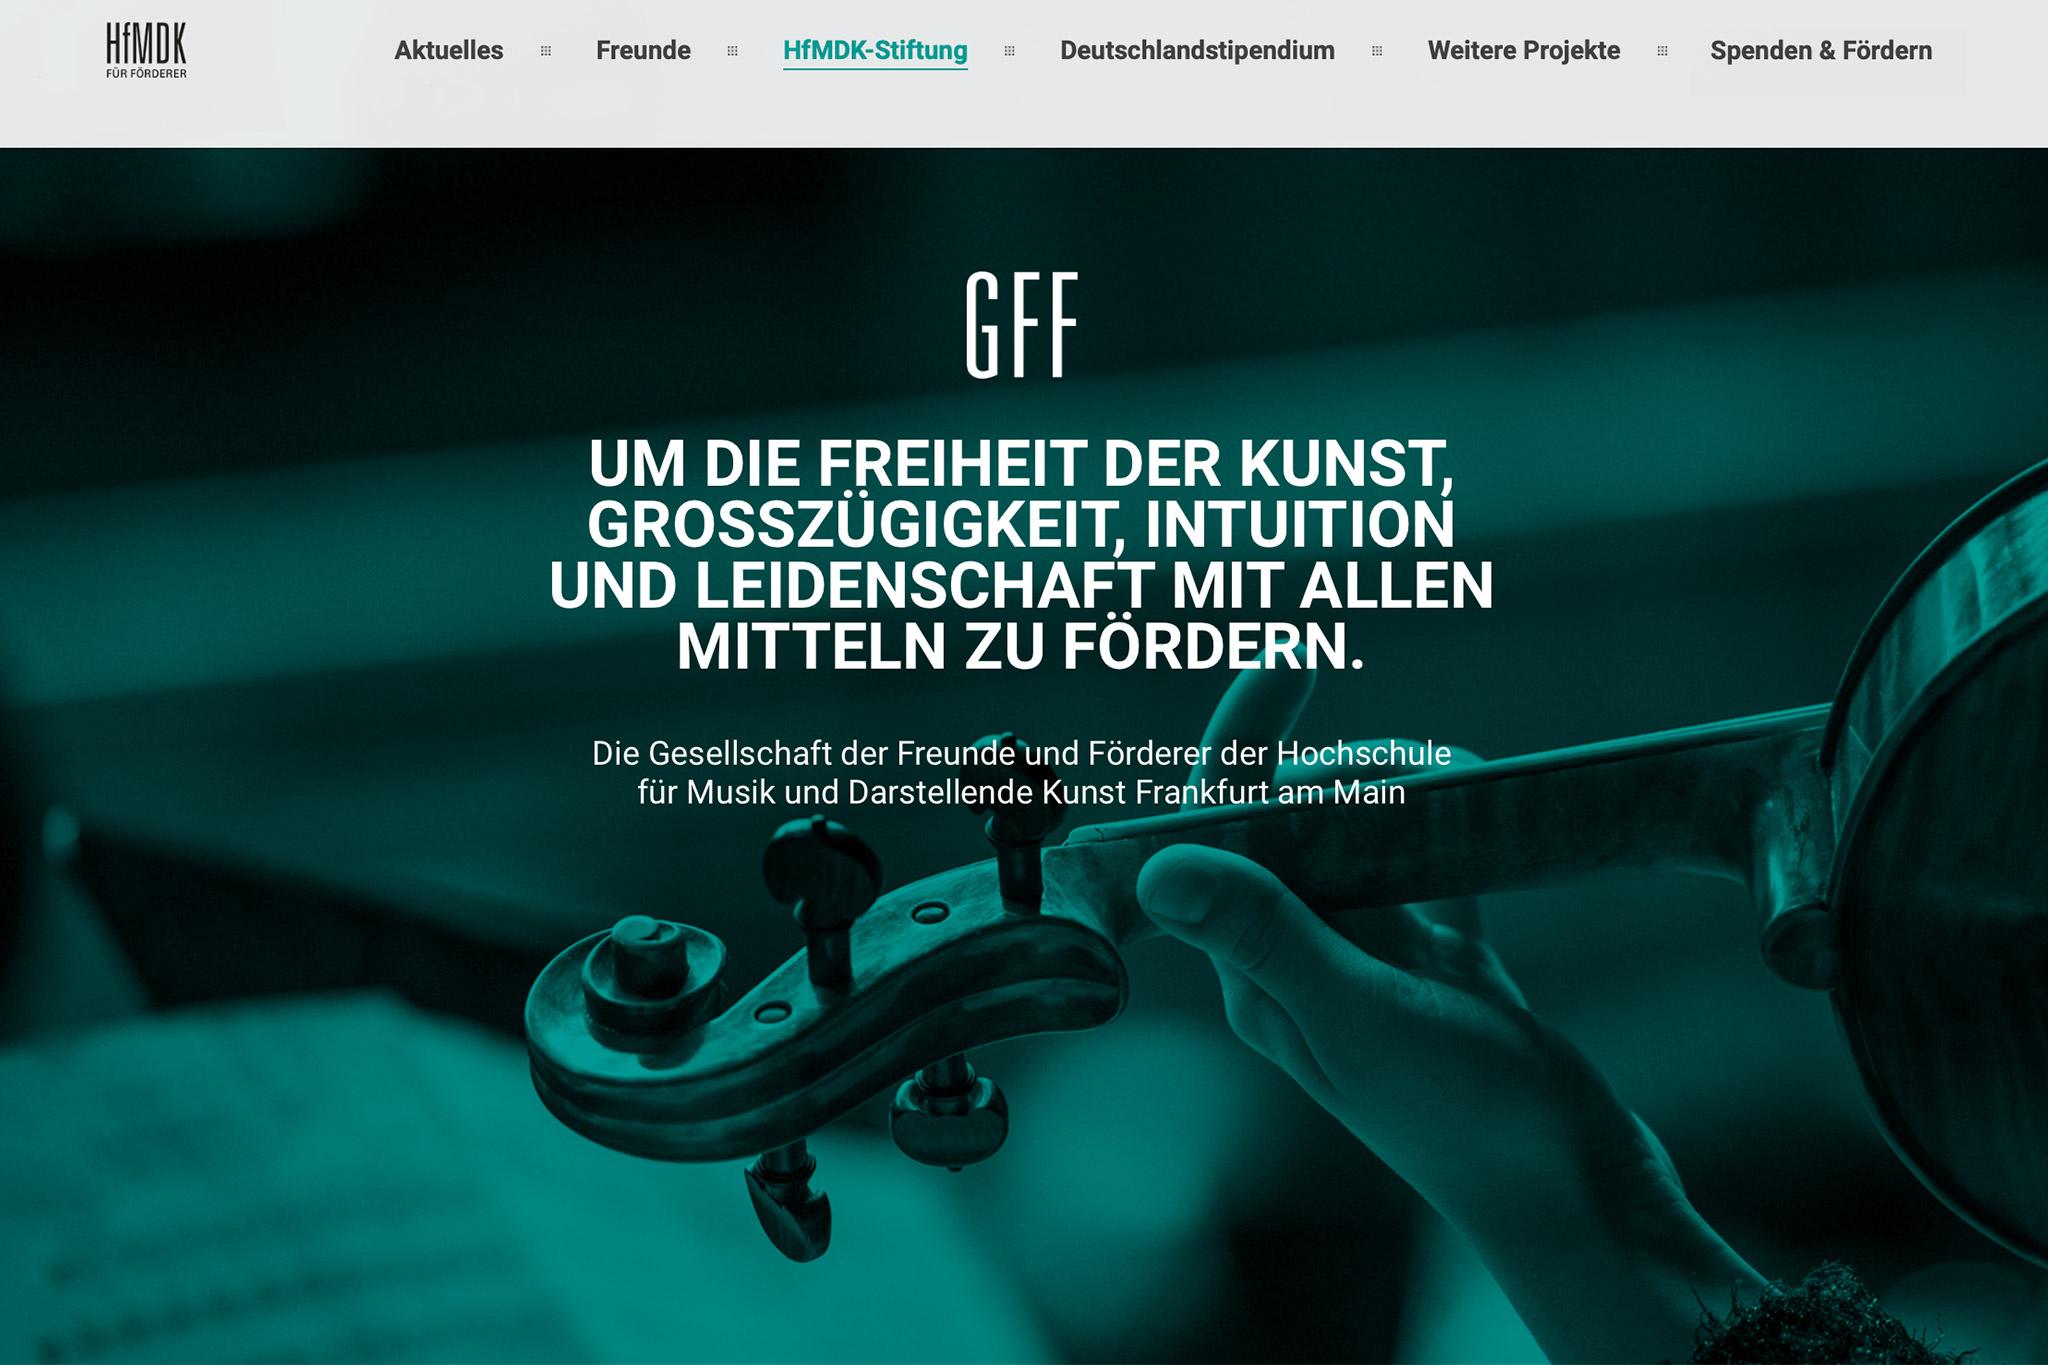 HfMDK Fördern, HfMDK Frankfurt am Main | Design: Johannes Willwacher